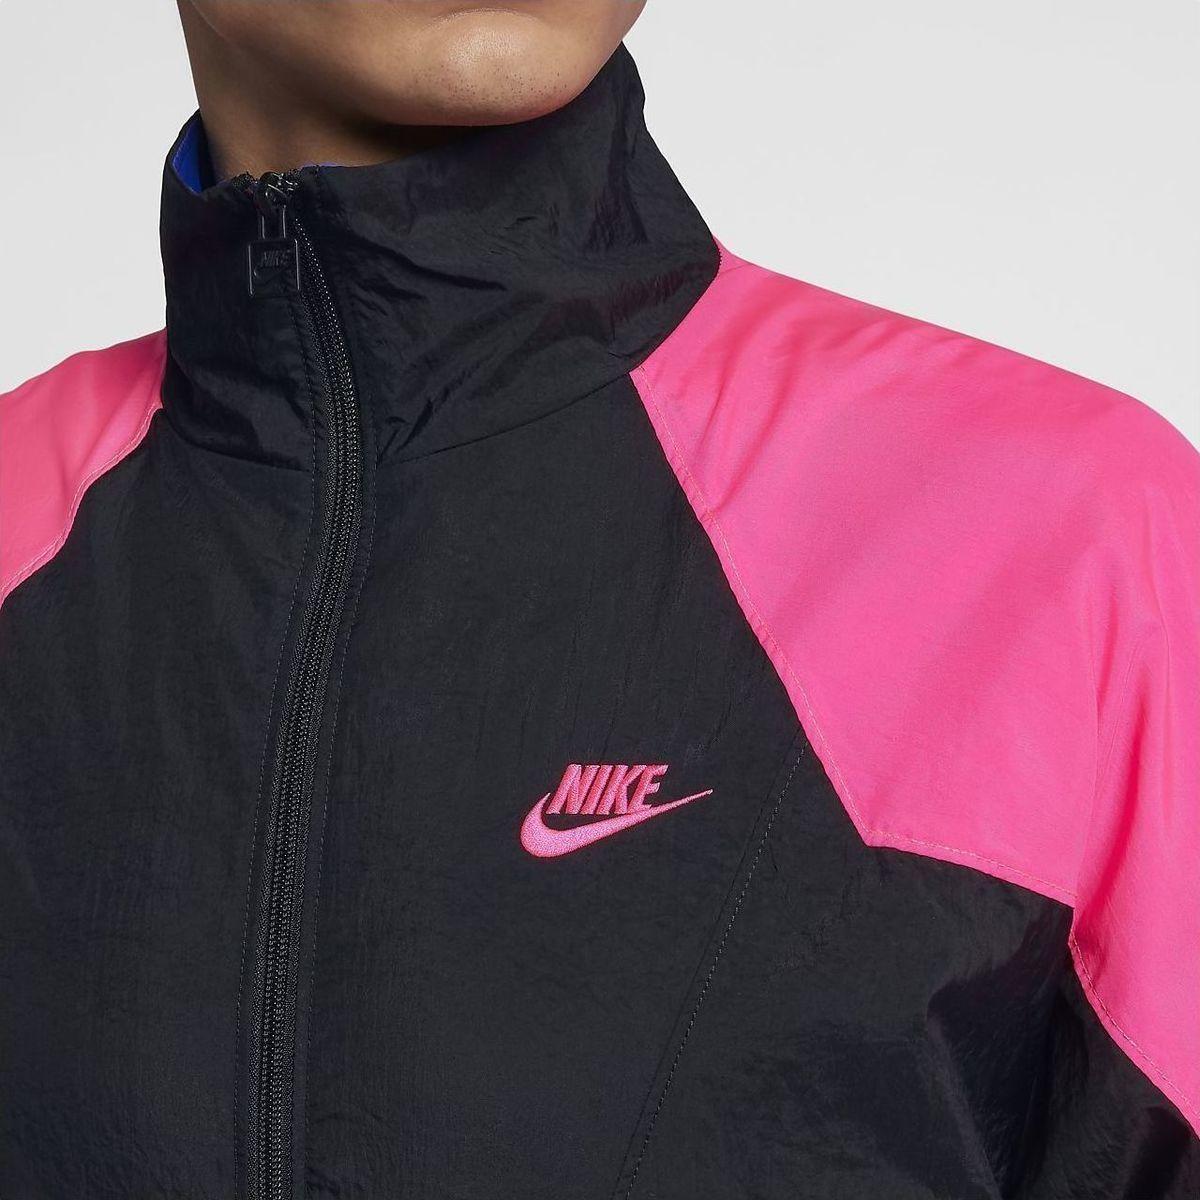 dfa8d66d986d0 Nike Sportswear Nsw Woven Vw Jacket Men Size and 50 similar items